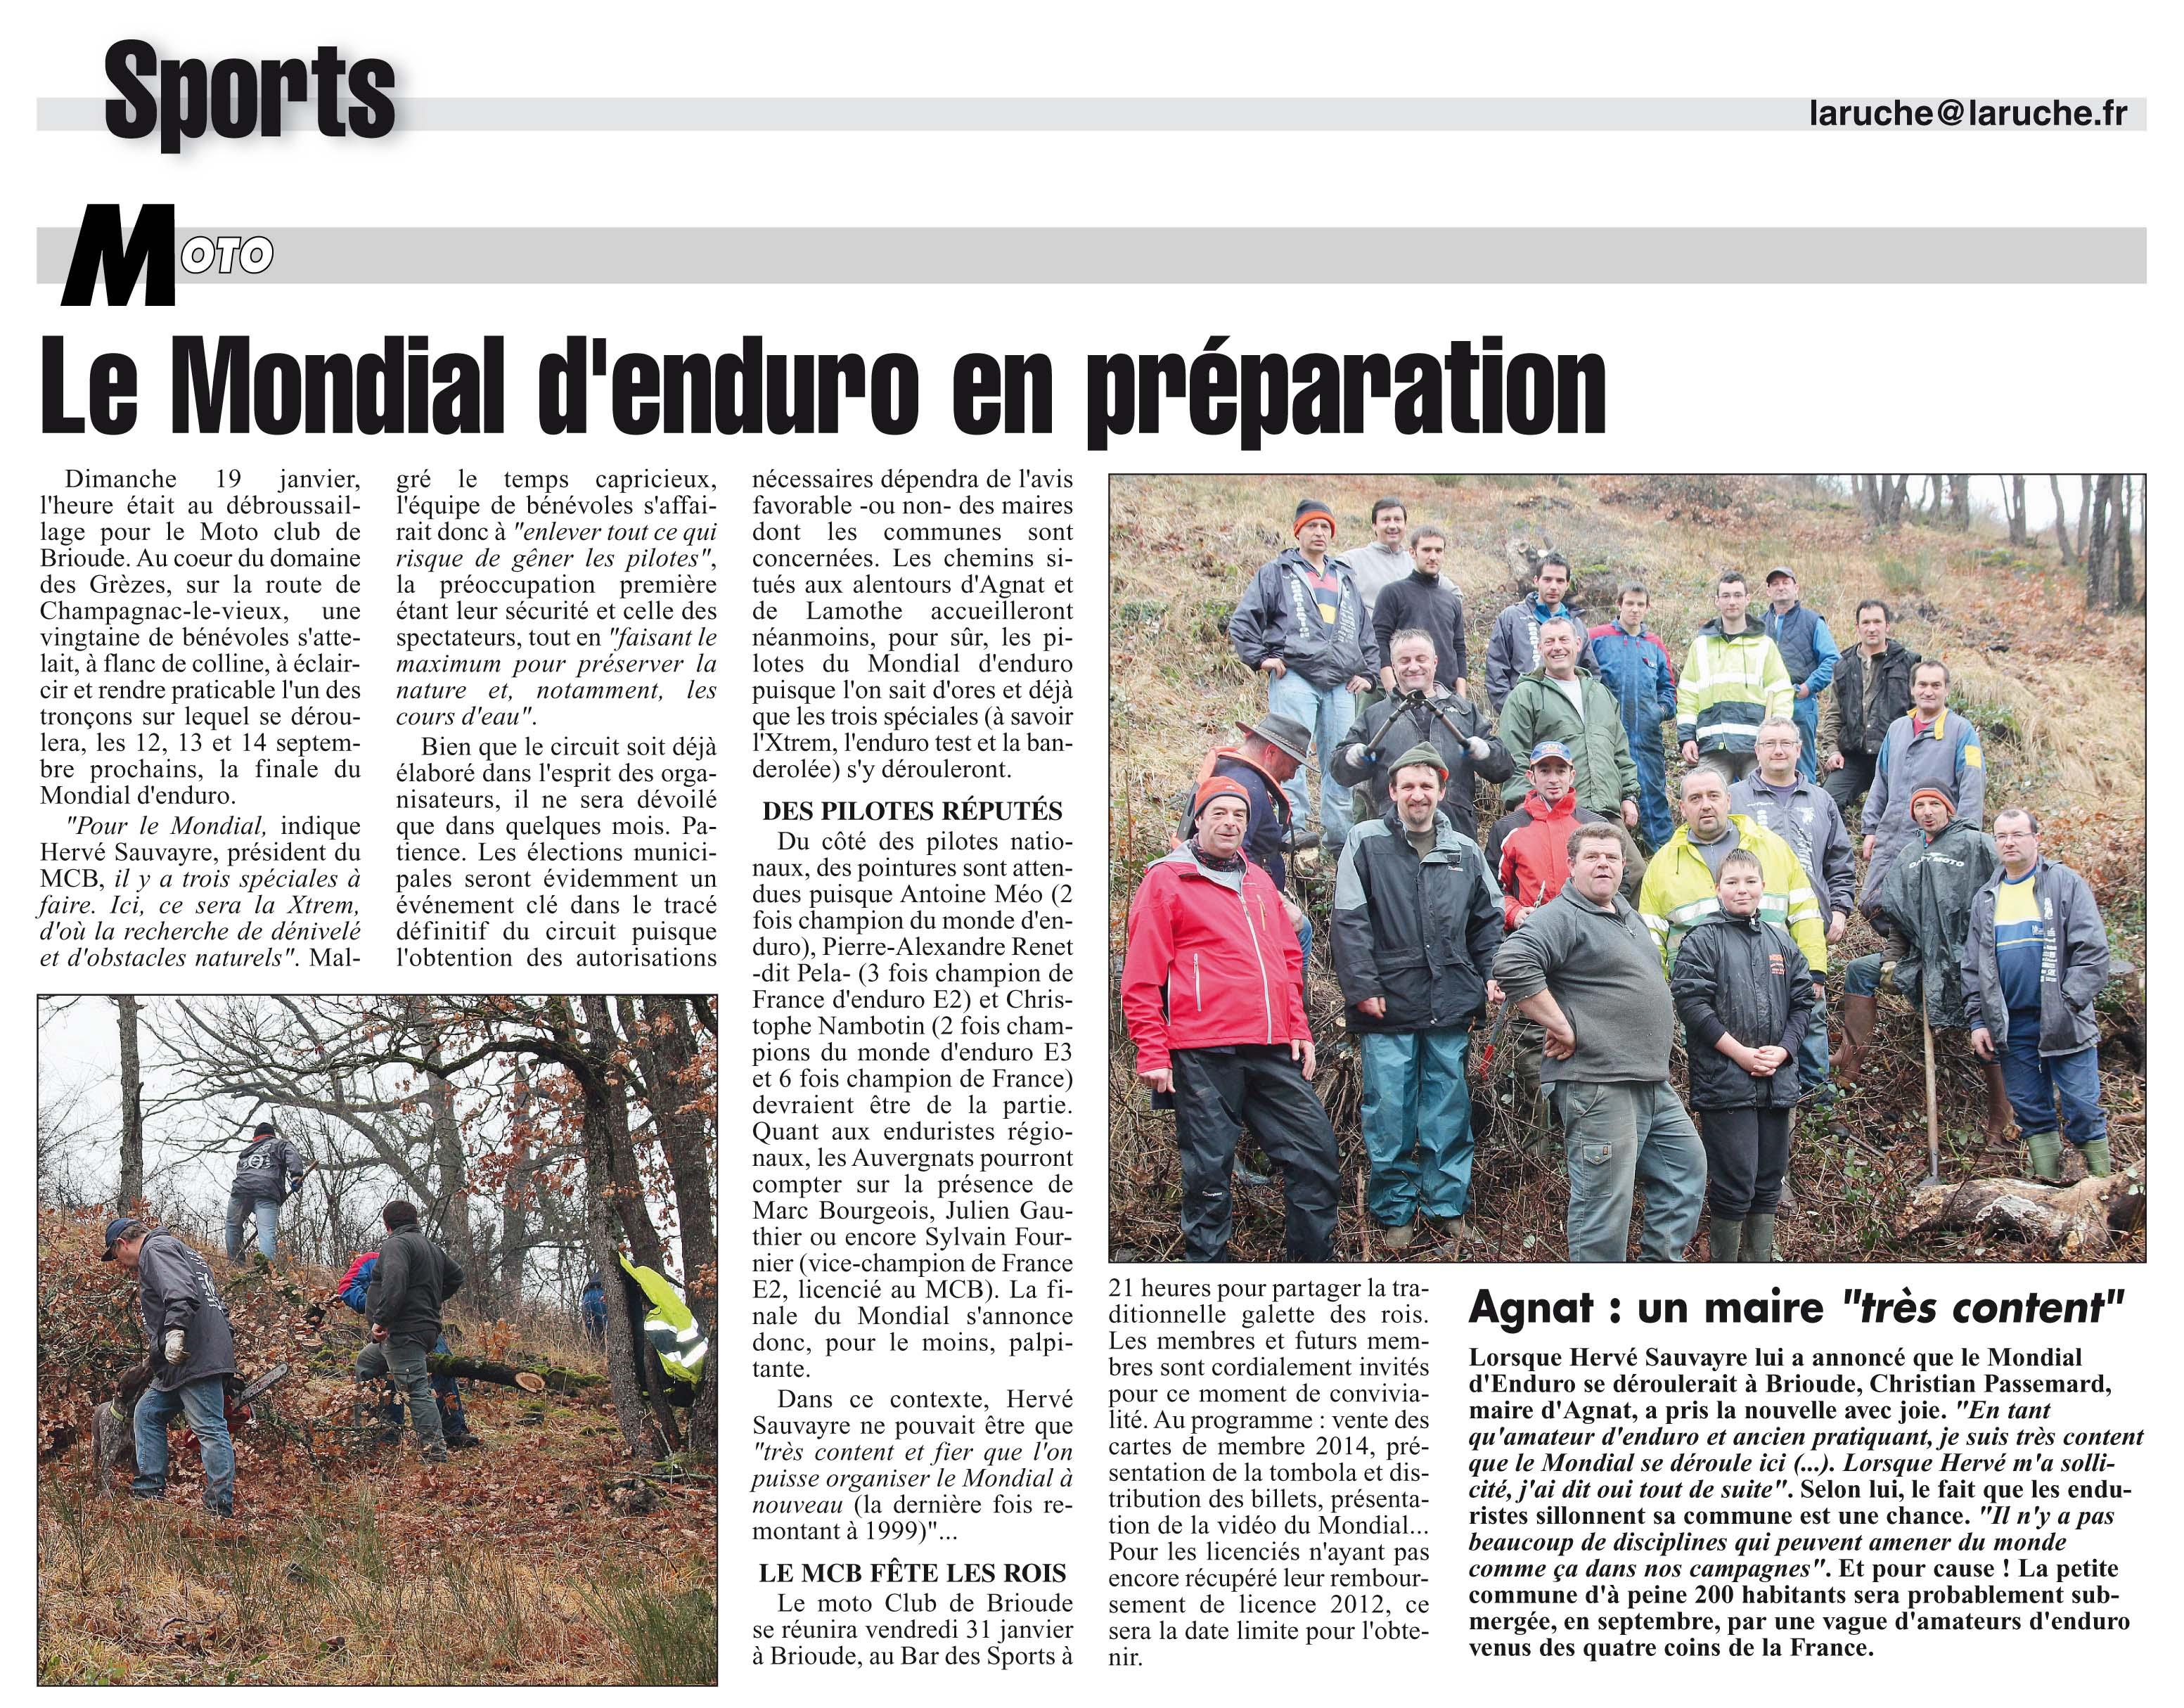 La Ruche 24/01/2014